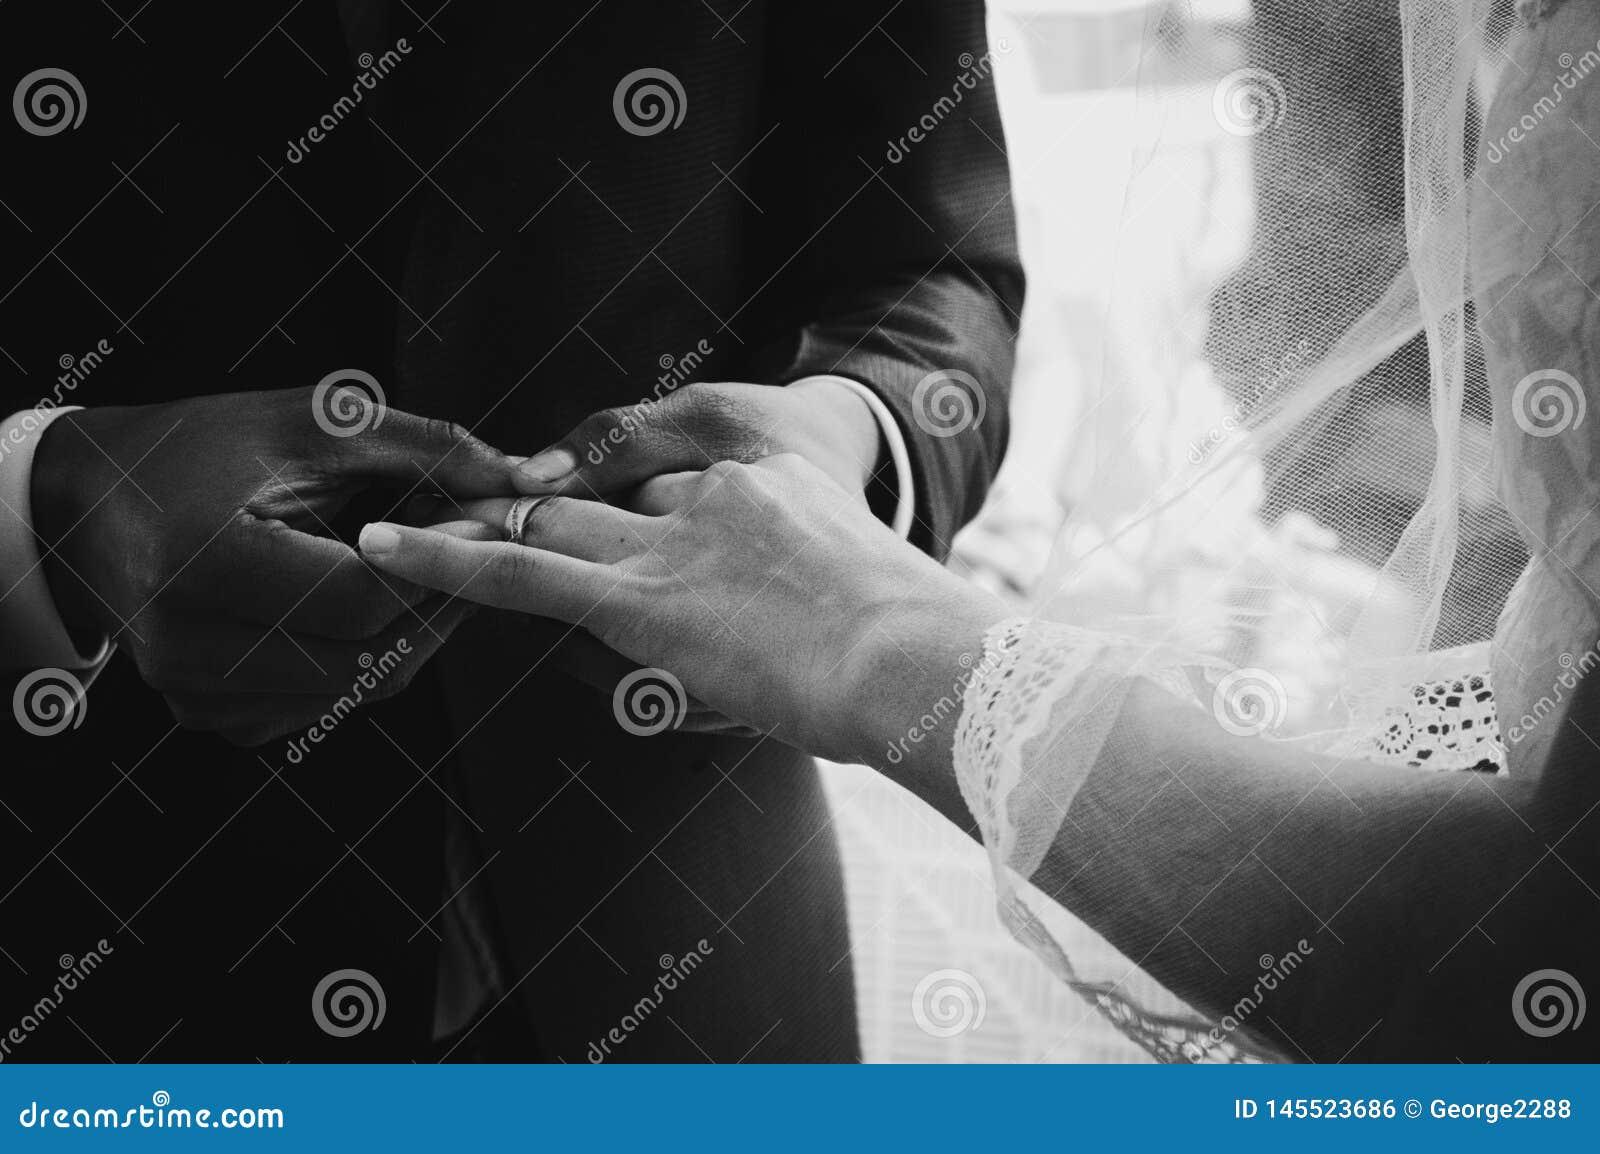 Acople das alian?as de casamento para sempre como um sinal do amor